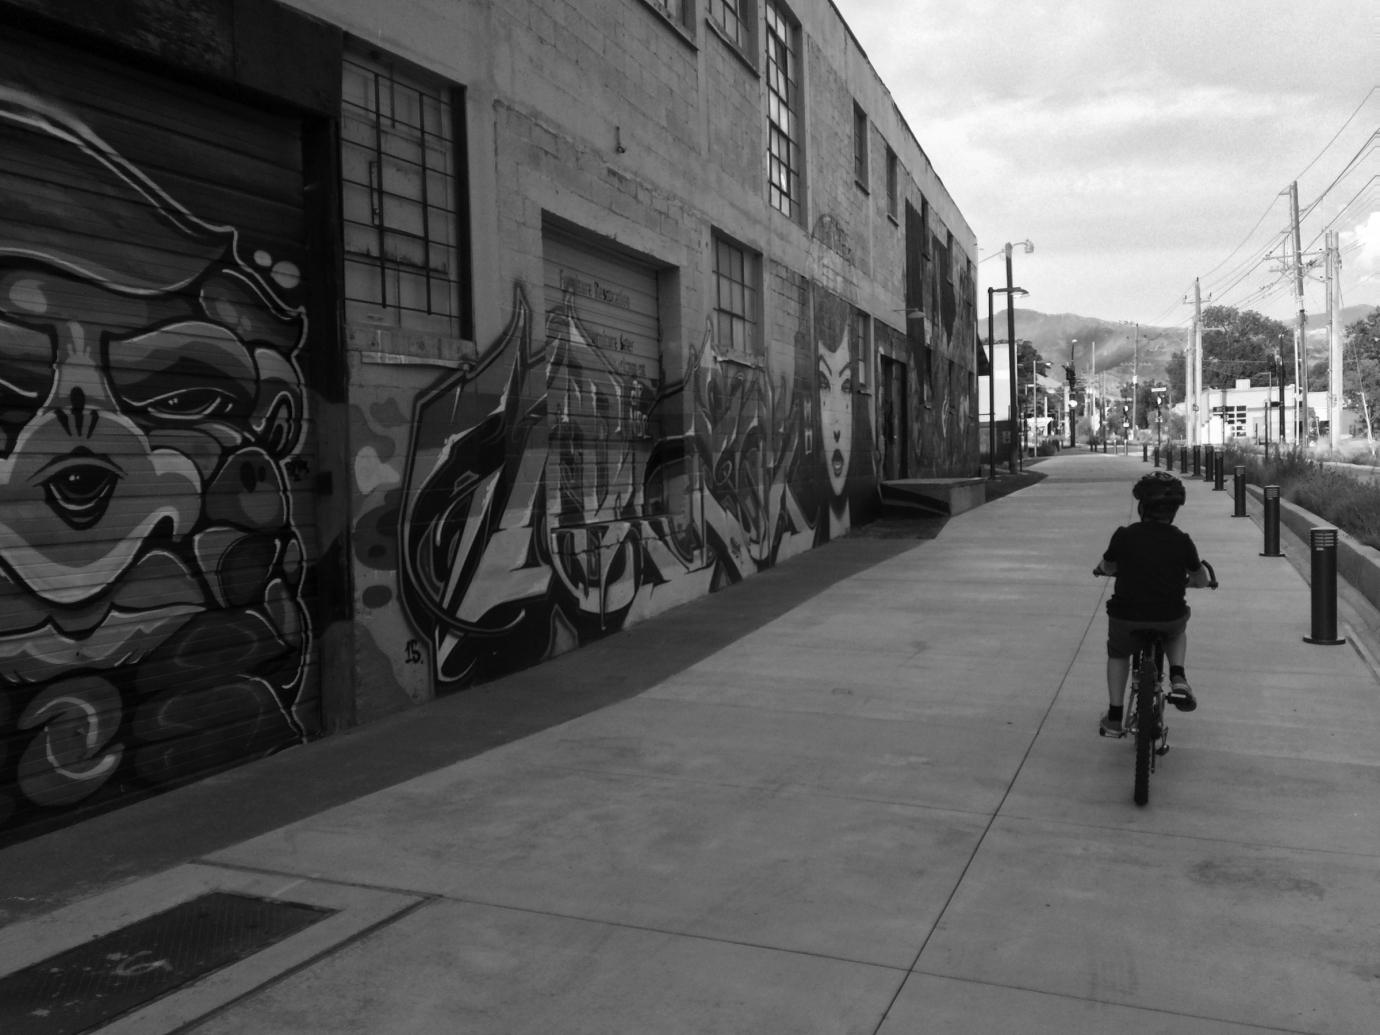 Julie_van_der_Wekken-Bike_Ride_by_Julie_van_der_Wekken